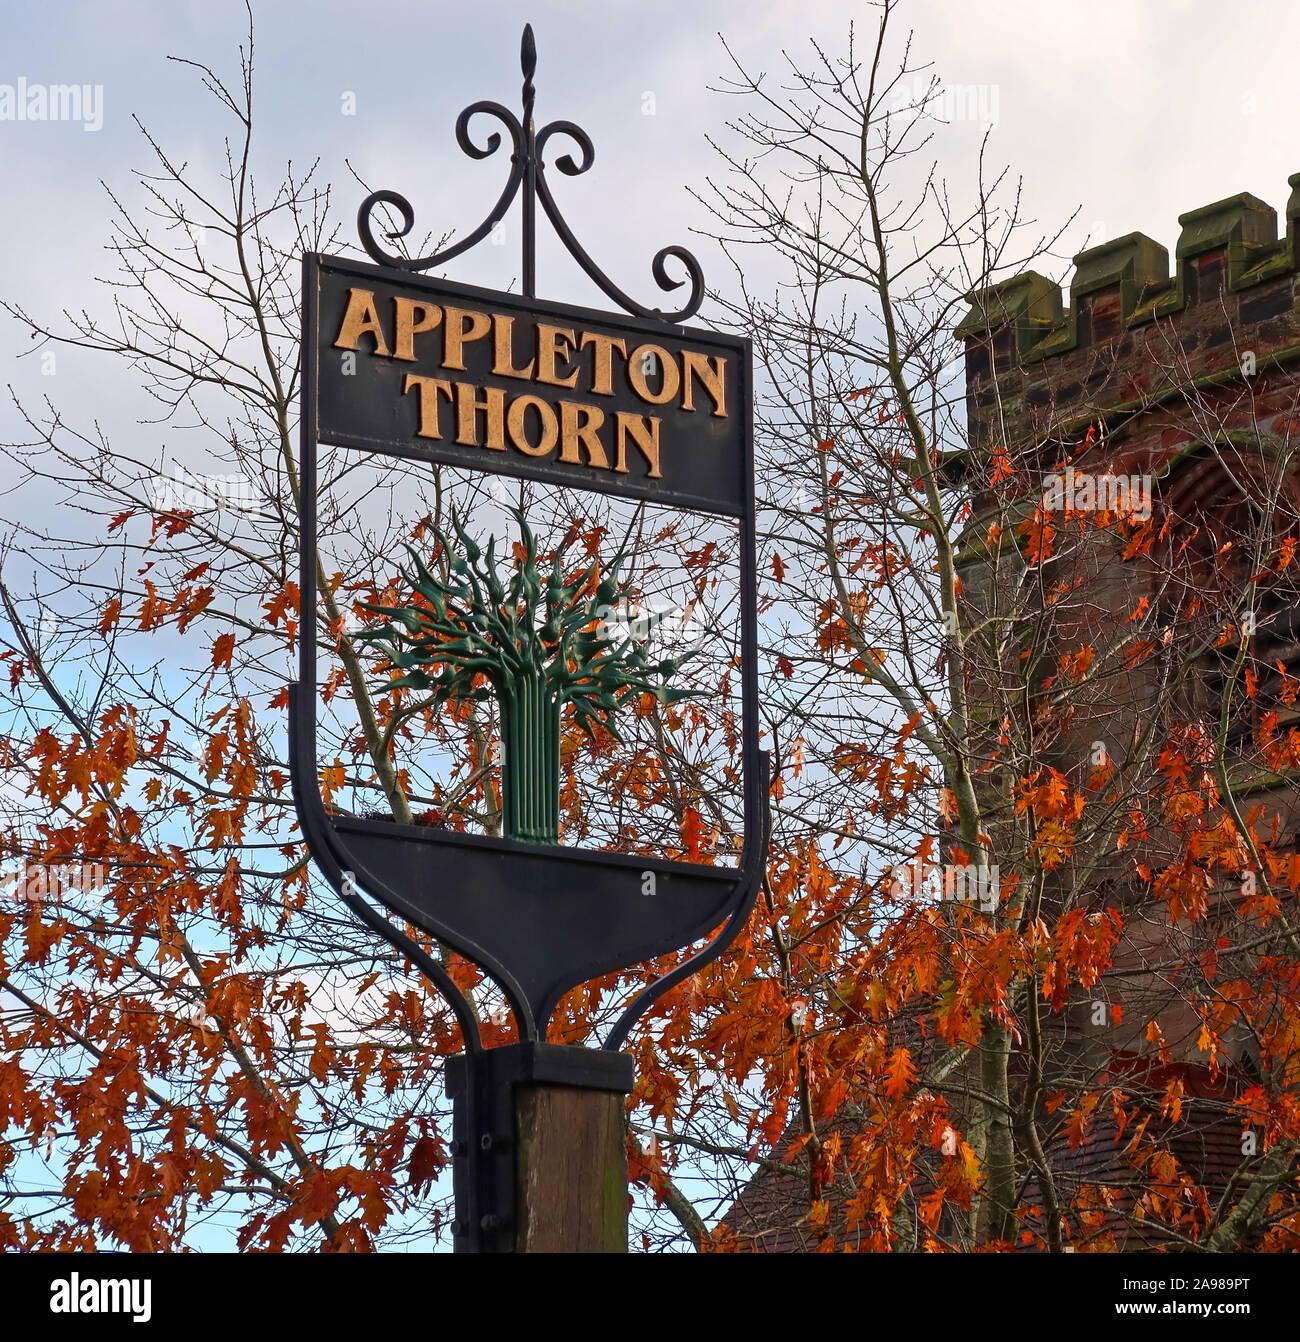 HotpixUK,@HotpixUK,GoTonySmith,Cheshire,England,Warrington,UK,WA4 4QX,Thorn,Warrington Villages,autumn,Epeltune,Bawming the Thorn,Bawning the Thorn,Thorn Cross HM Prison,YOI,Young Offenders Institute,HMS Blackcap,HMS Black cap